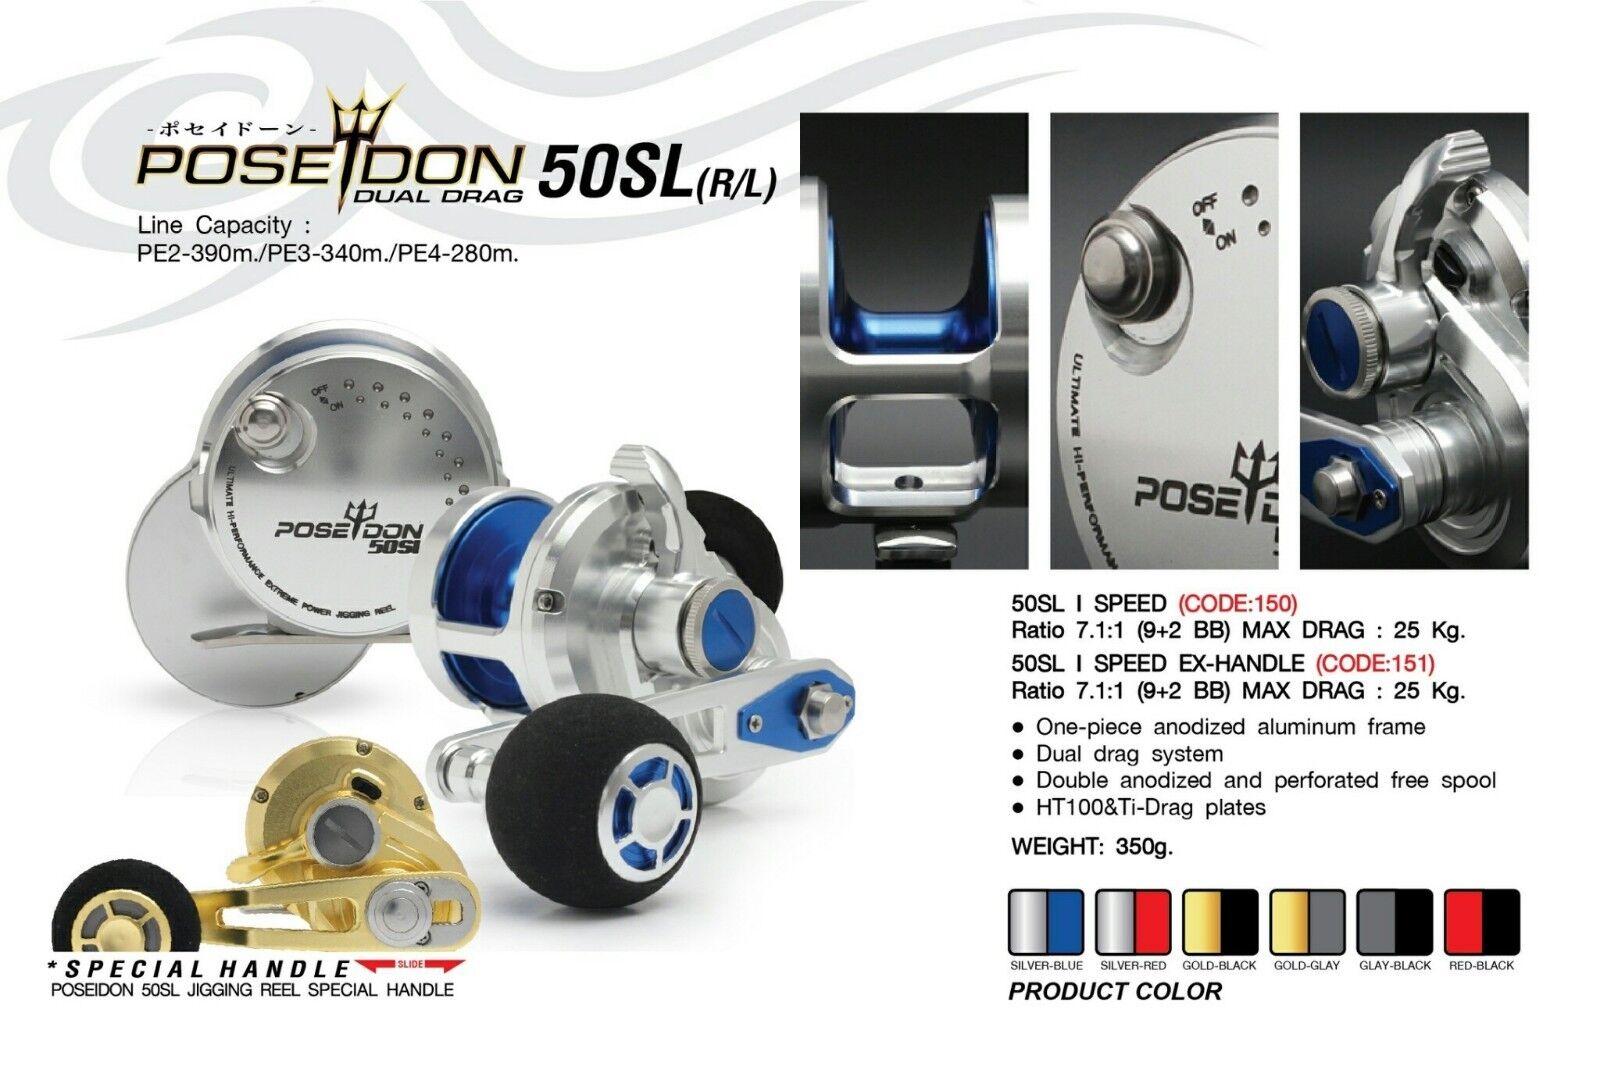 POSEIDON 50SL RL JIGGING REEL RIGHT SALTWATER Adjustable handle